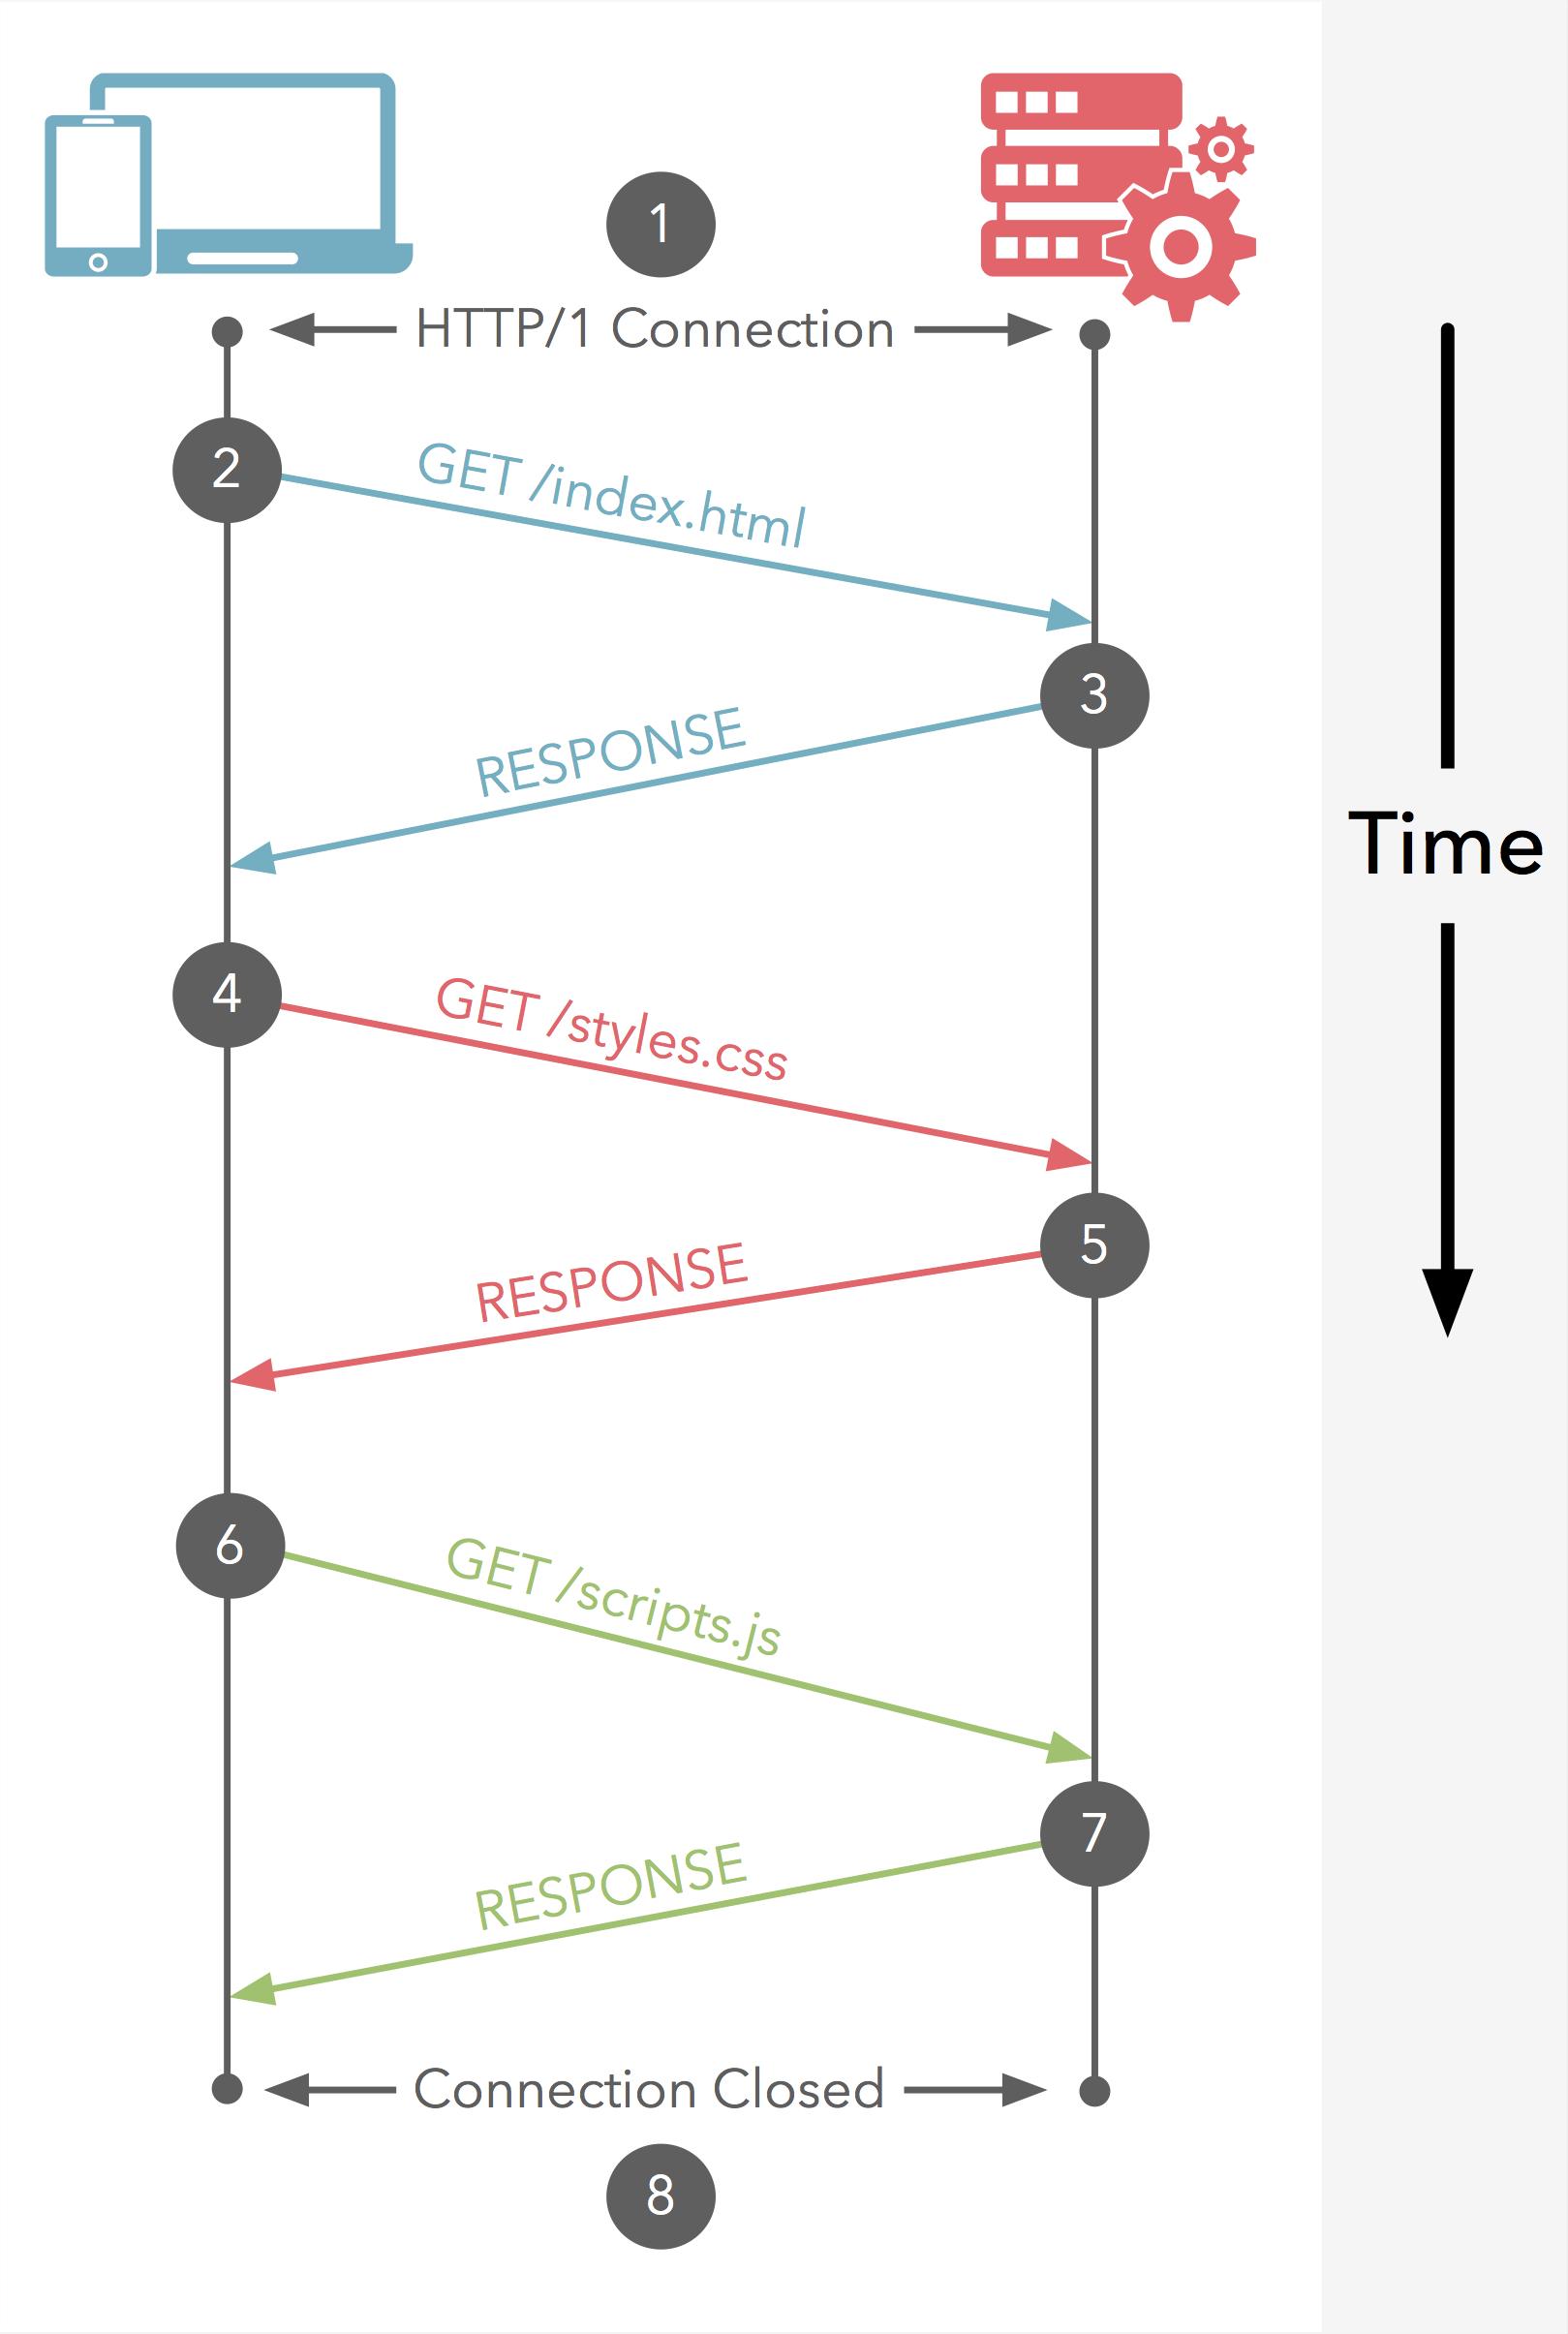 HTTP/1 请求/响应 循环